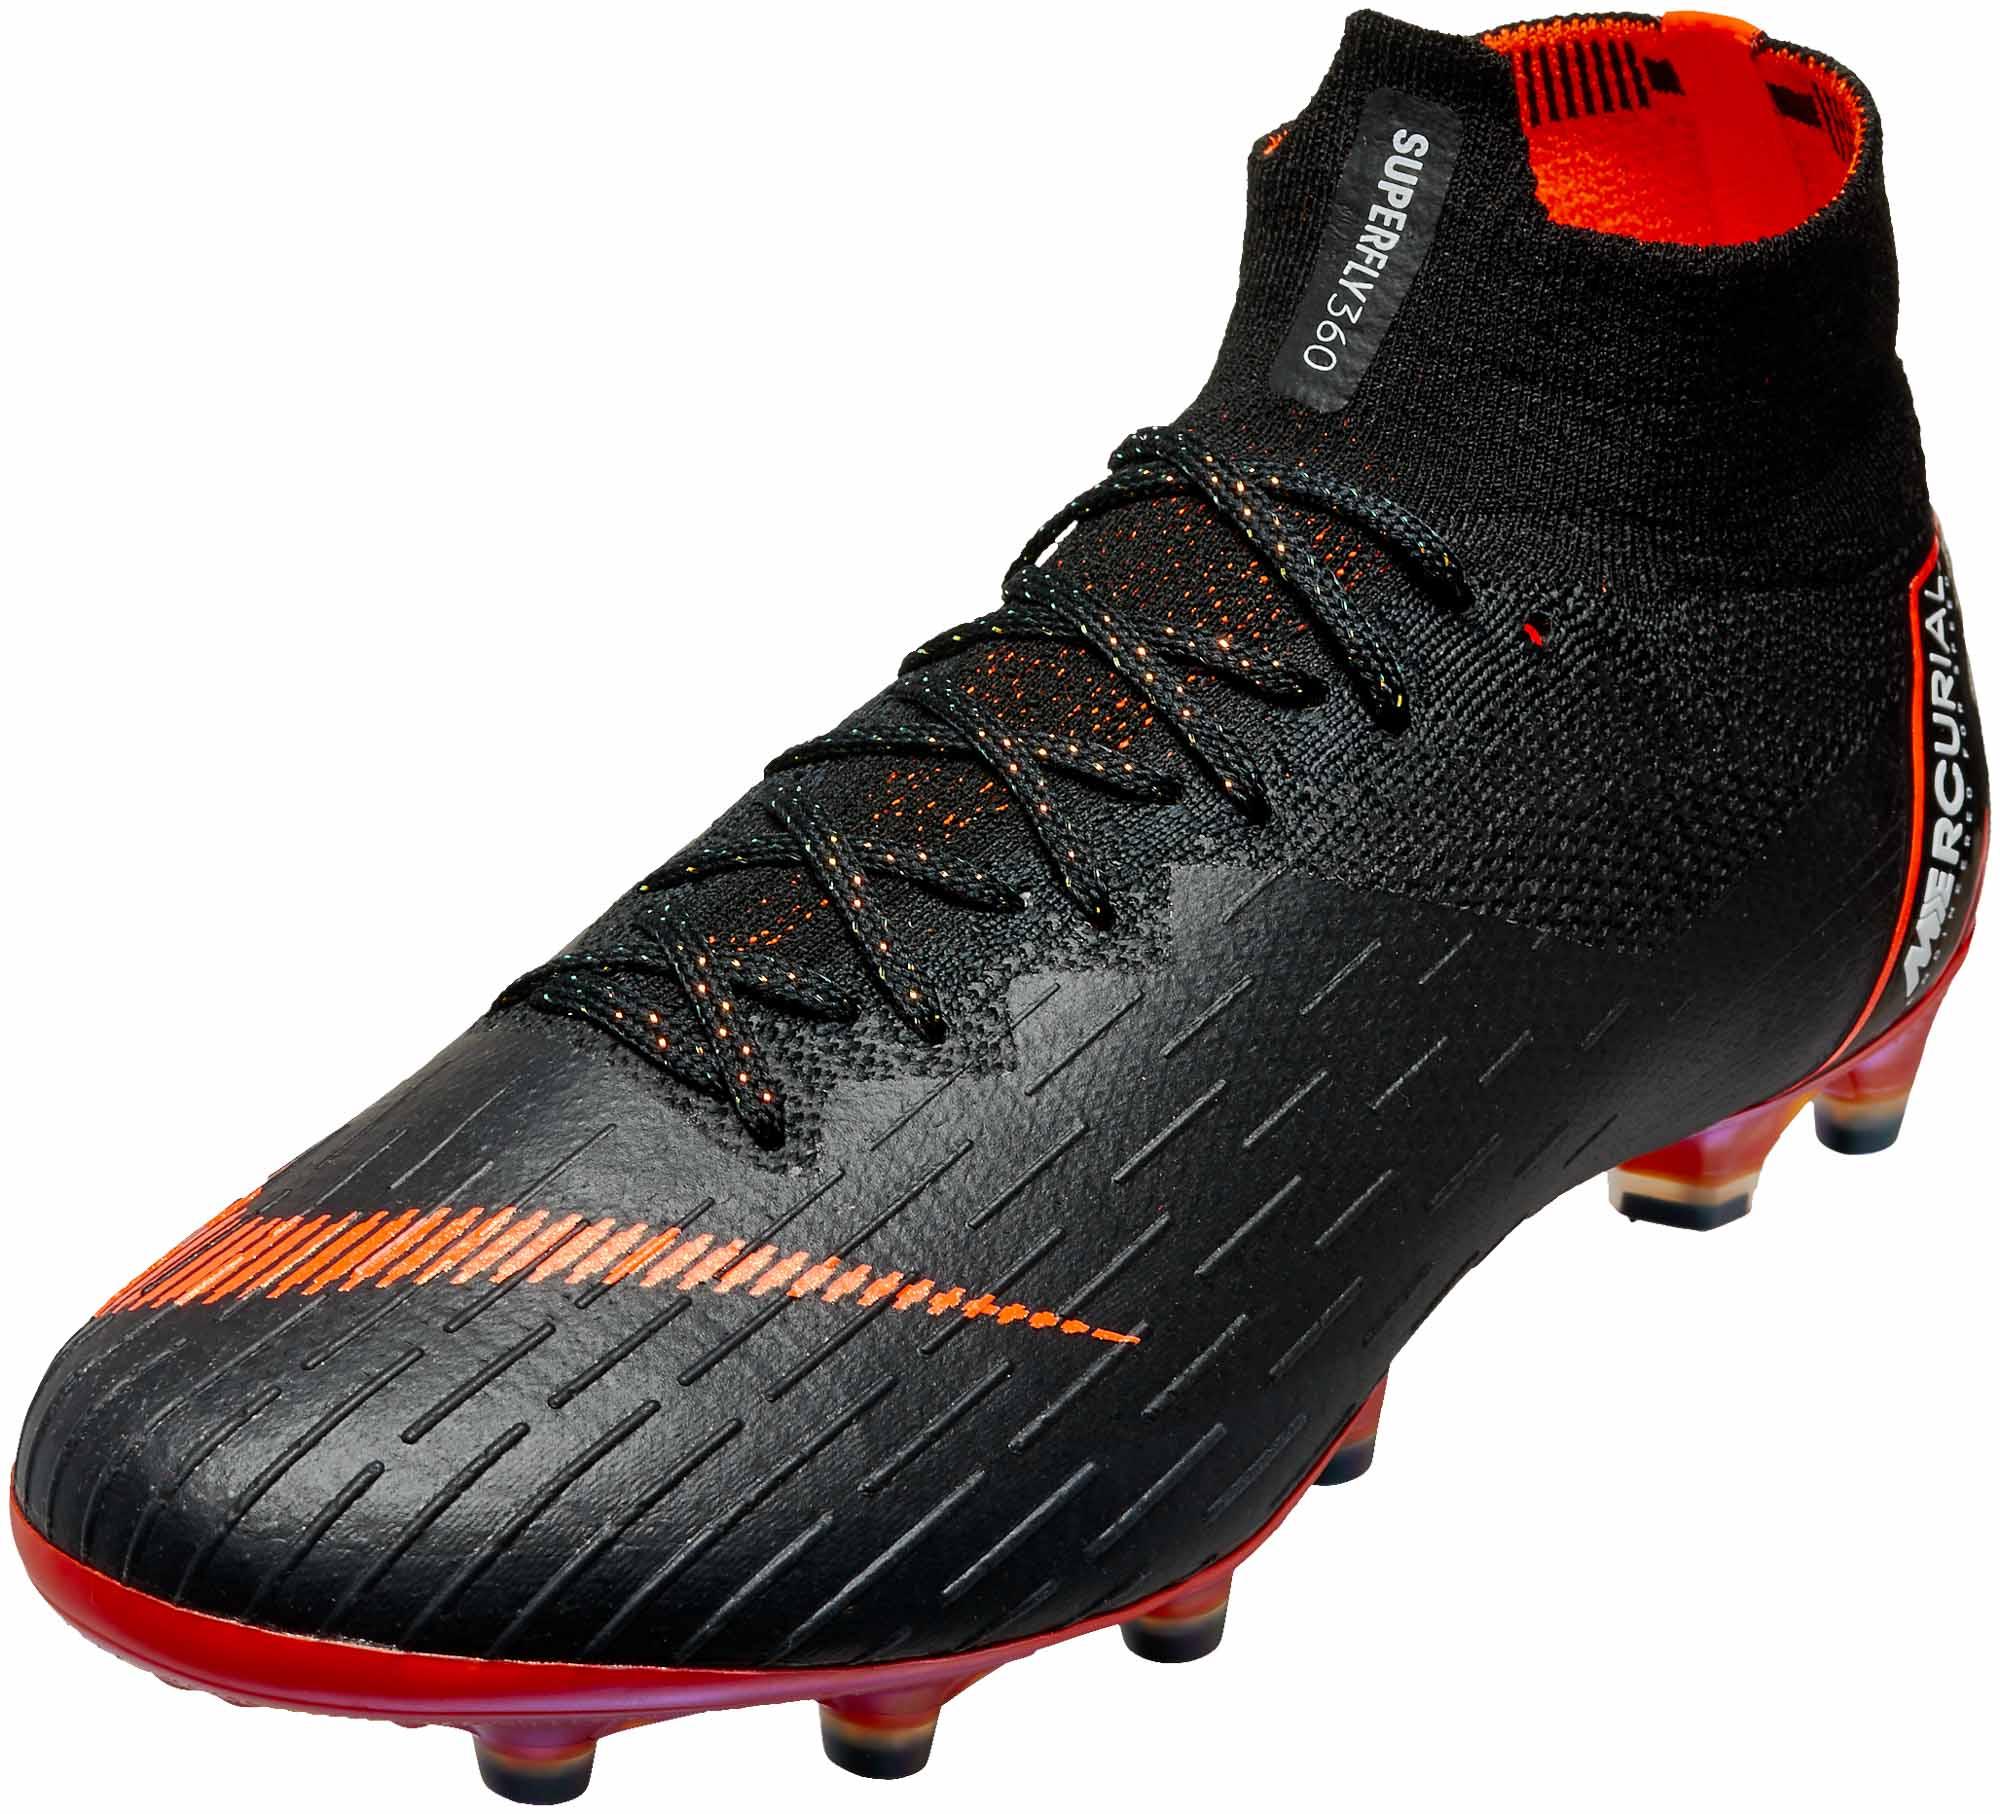 556b061c89a3 Nike Superfly 6 Elite AG-Pro Soccer Cleats - SoccerPro